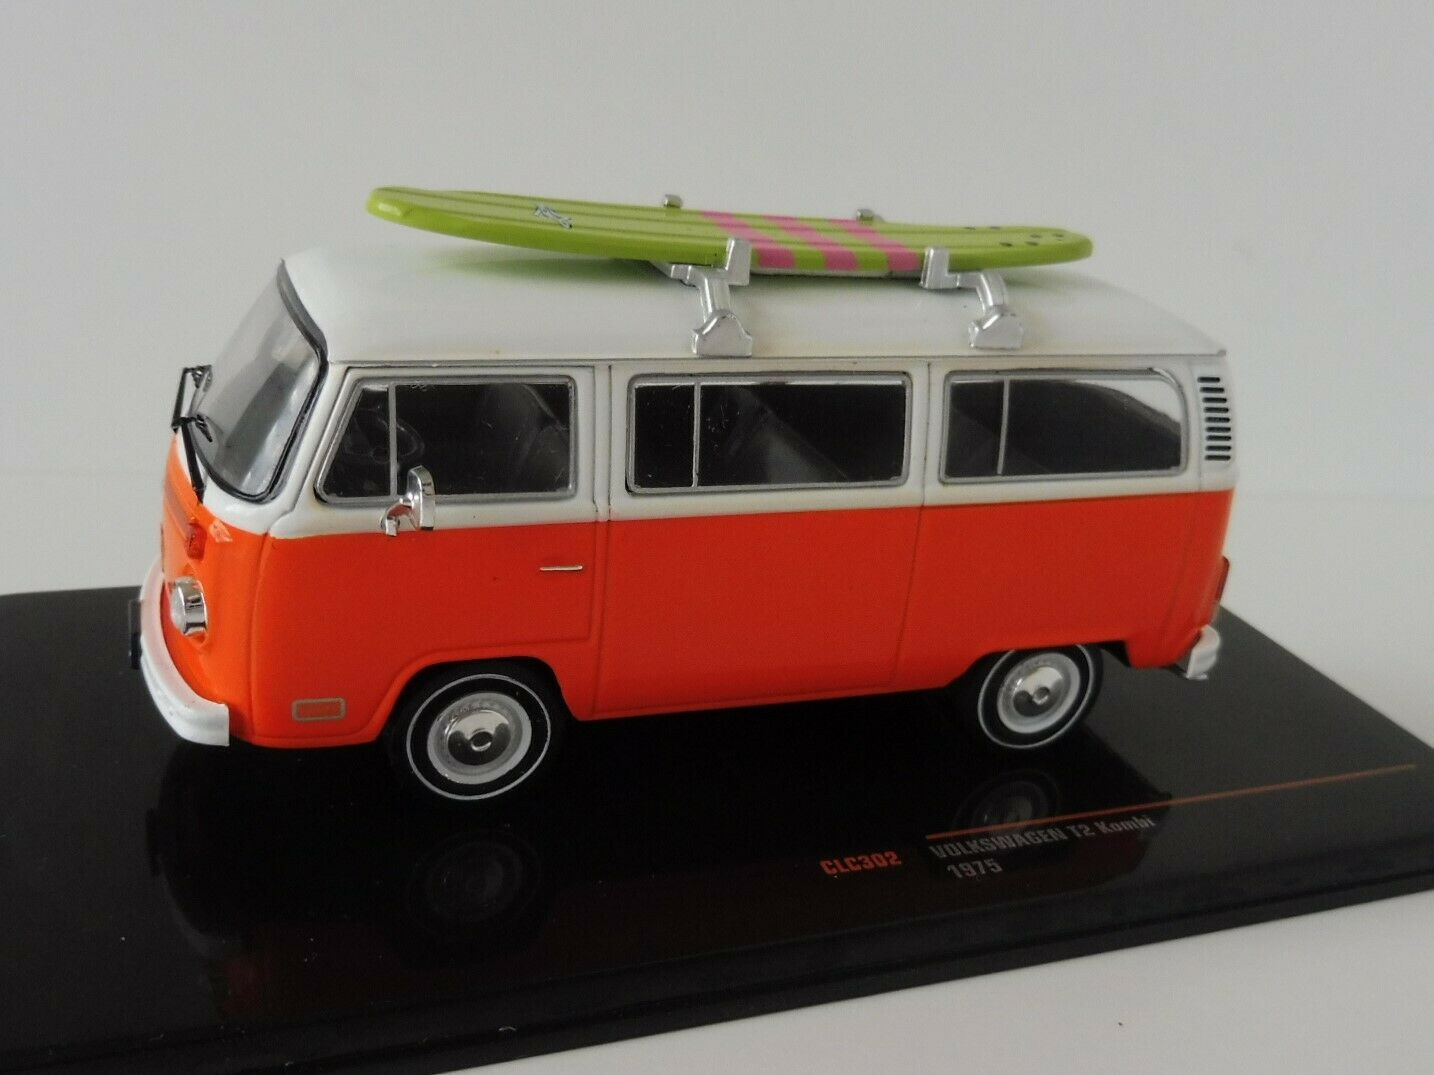 40% de descuento VW t2 coche familiar 1975 naranja surfboard 1 43 ixoclc ixoclc ixoclc 302 Type autobús volkswagen descubrimos Ixo  envío gratis